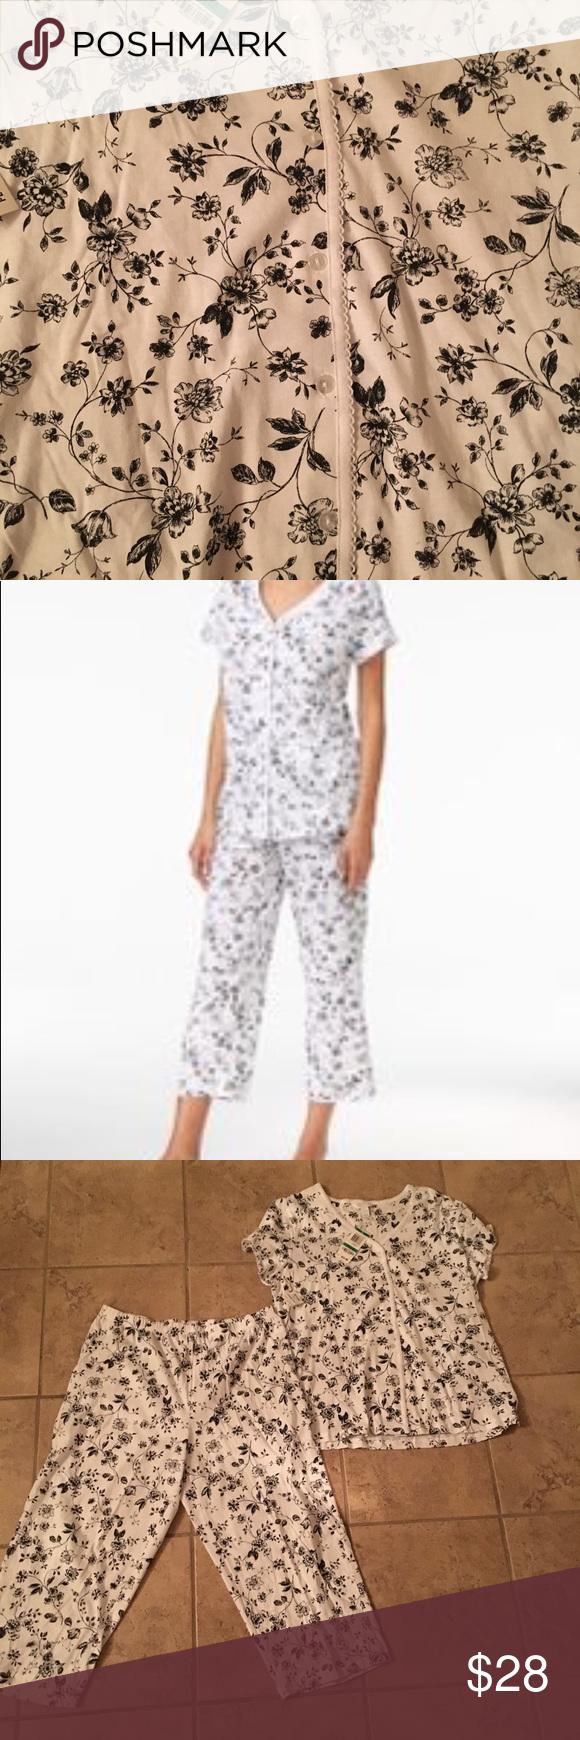 677fa7b6723e Charter Club - size P/L Pajama Set,NWT Charter Club - size P/L petite large  Loop-trimmed Top And Cropped Pants Pajama Set, NWT Only At Macy's #7PA  smoker ...